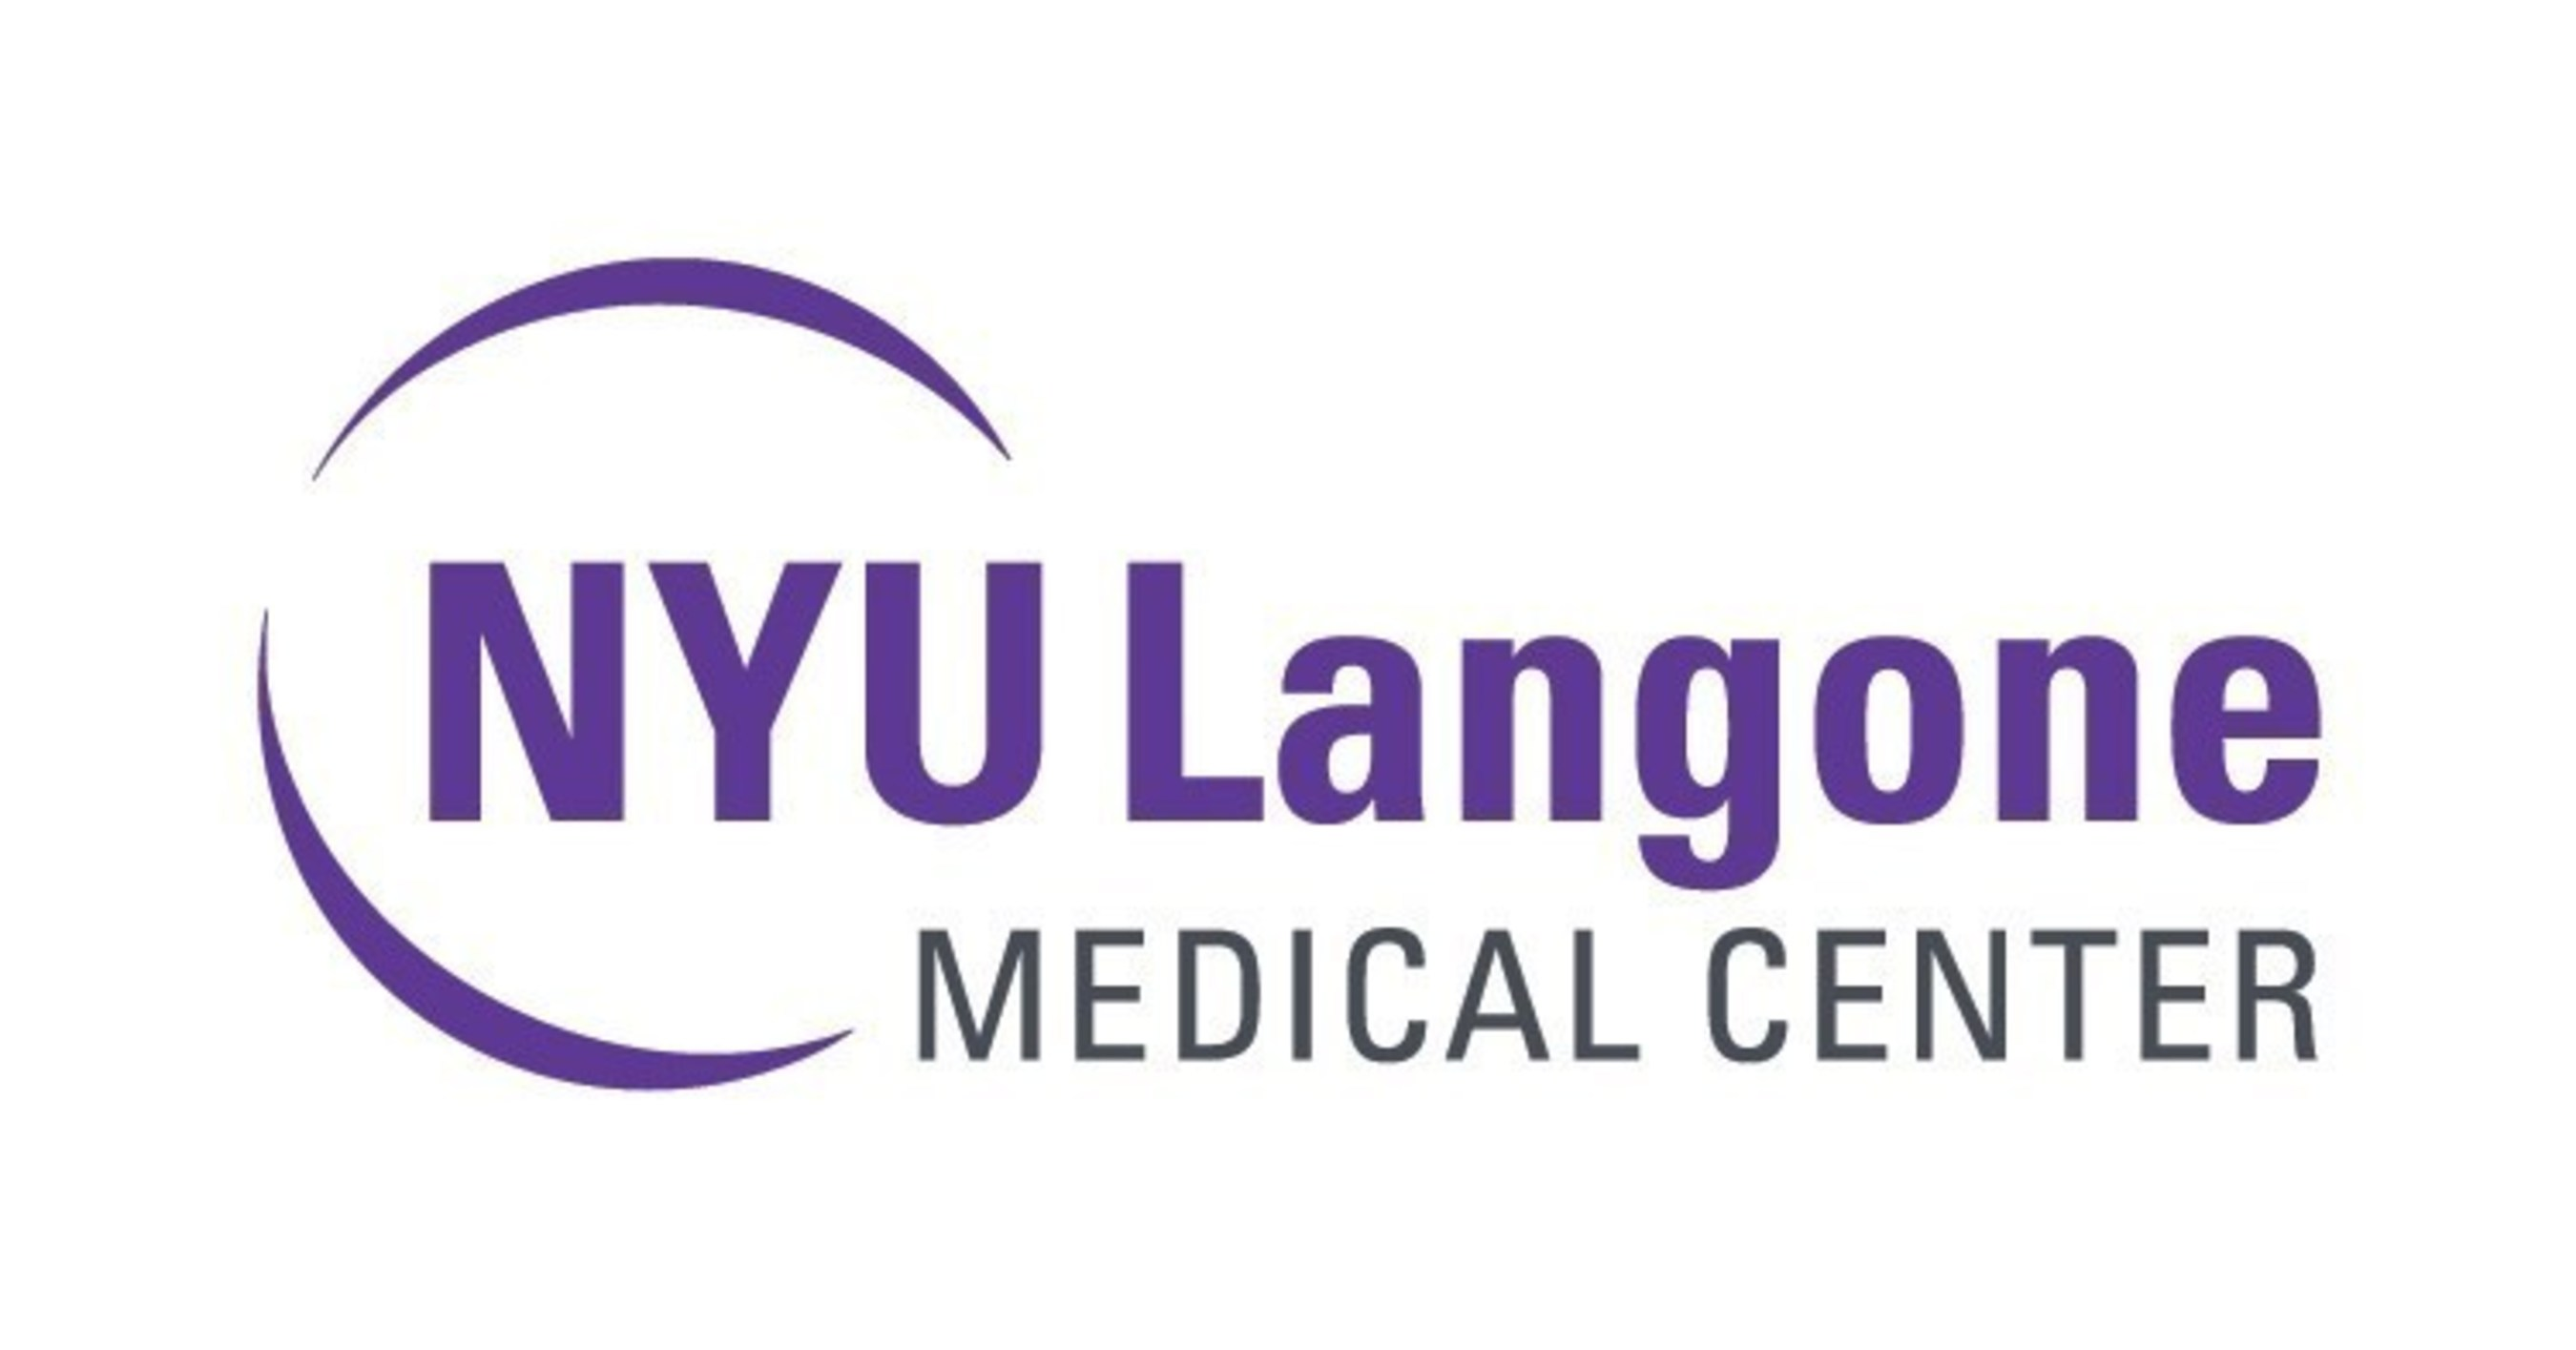 NYU Langone Medical Center and Winthrop-University Hospital